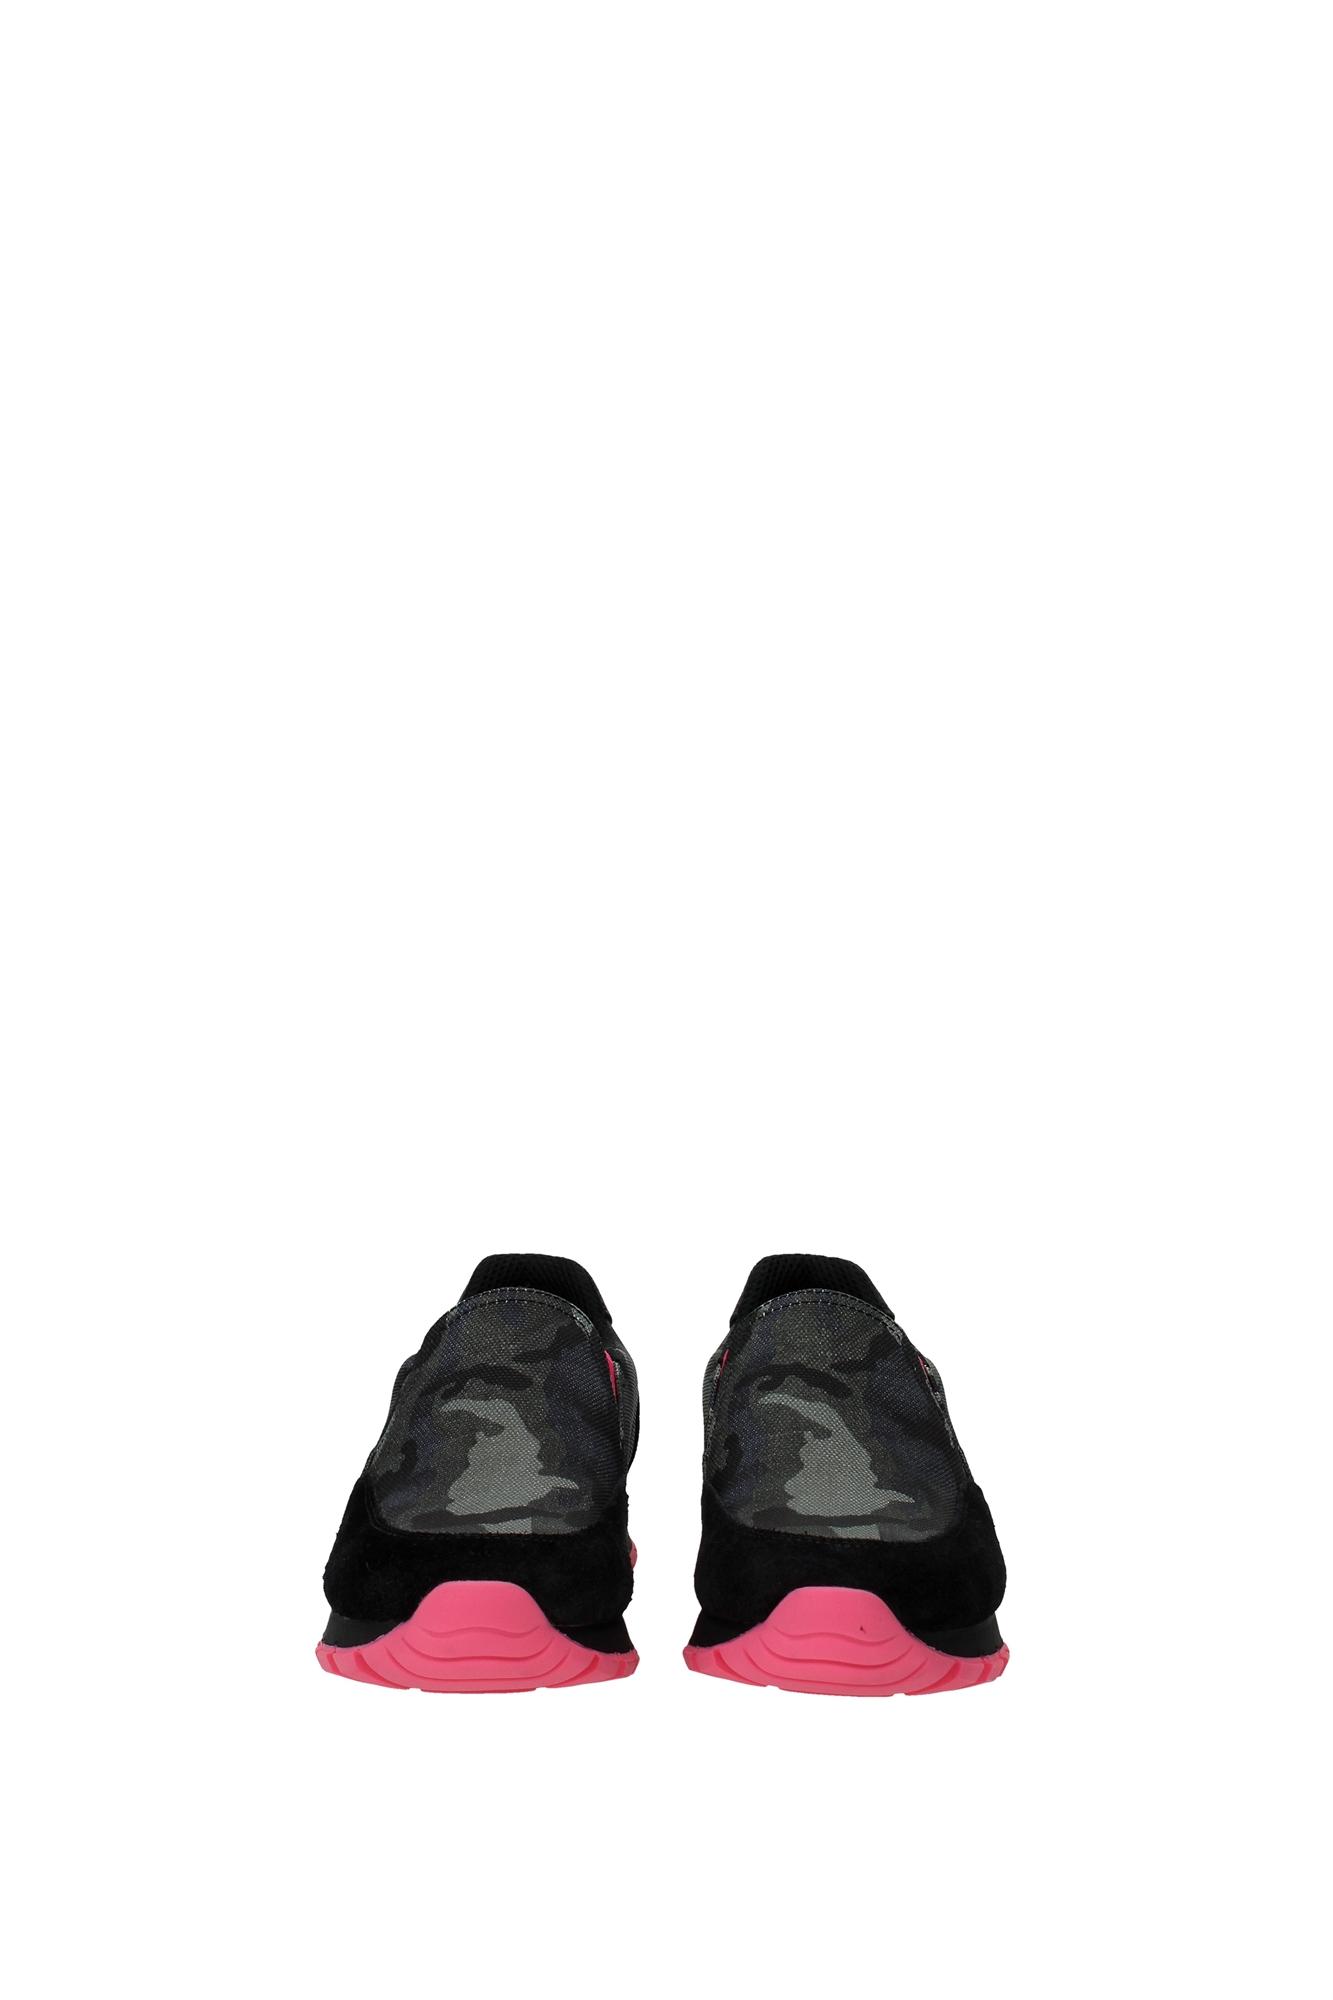 sneakers prada damen stoff gr n 3s5947pink ebay. Black Bedroom Furniture Sets. Home Design Ideas